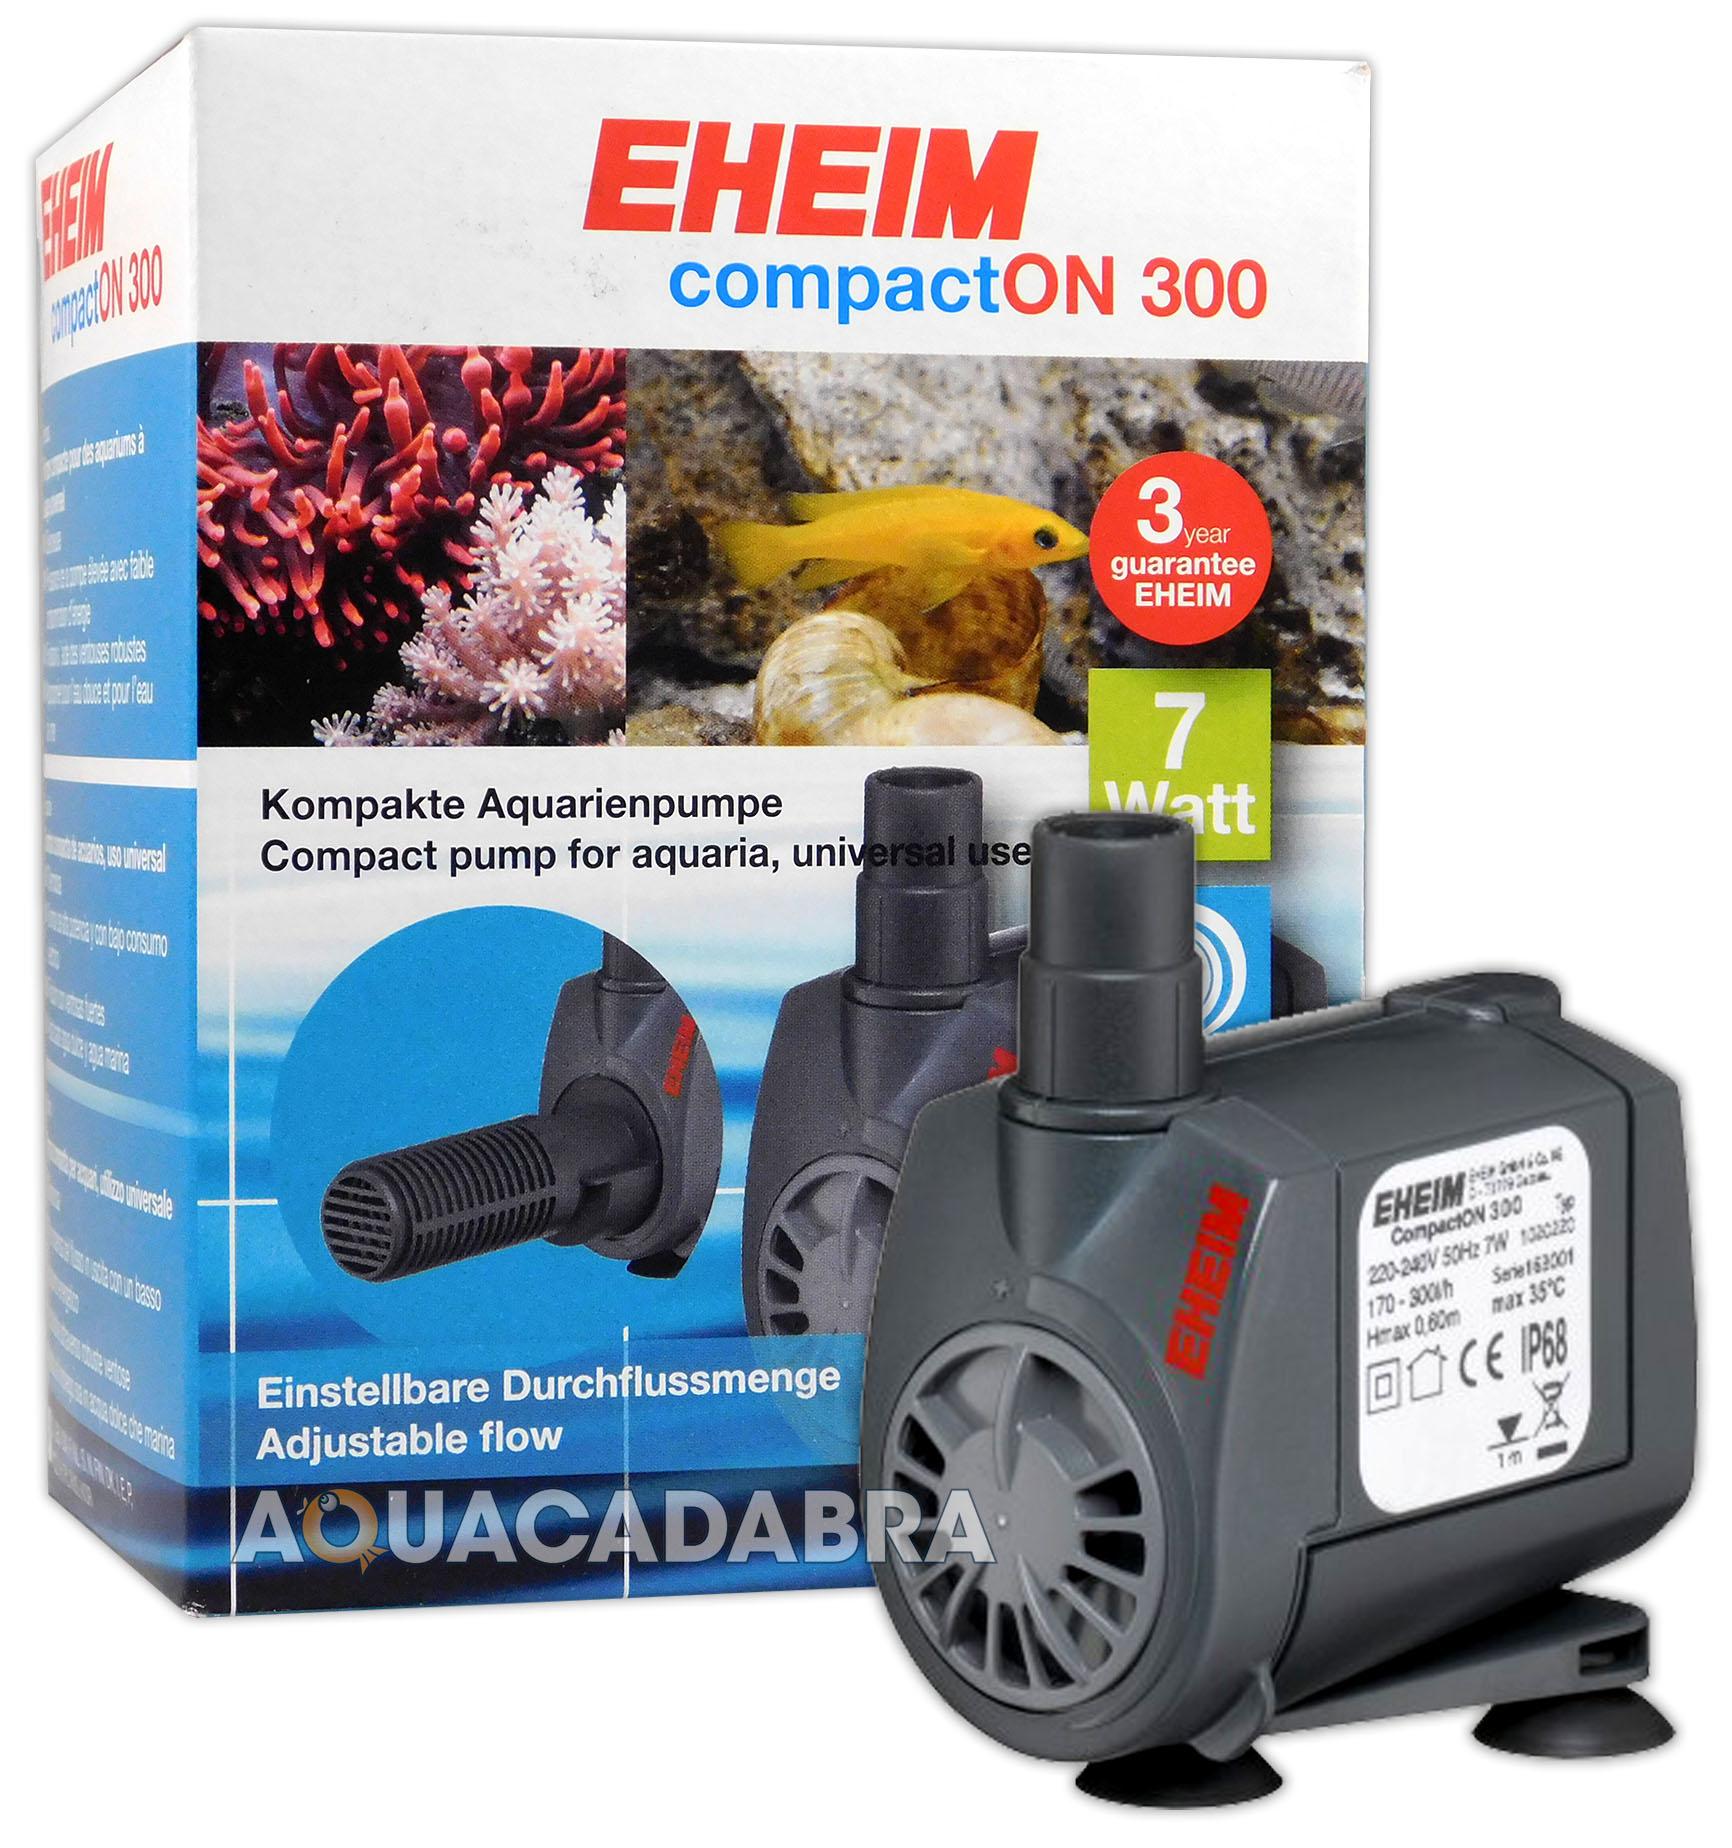 eheim compact 300 aquarium pump marine tropical sump tank fish filter ebay. Black Bedroom Furniture Sets. Home Design Ideas